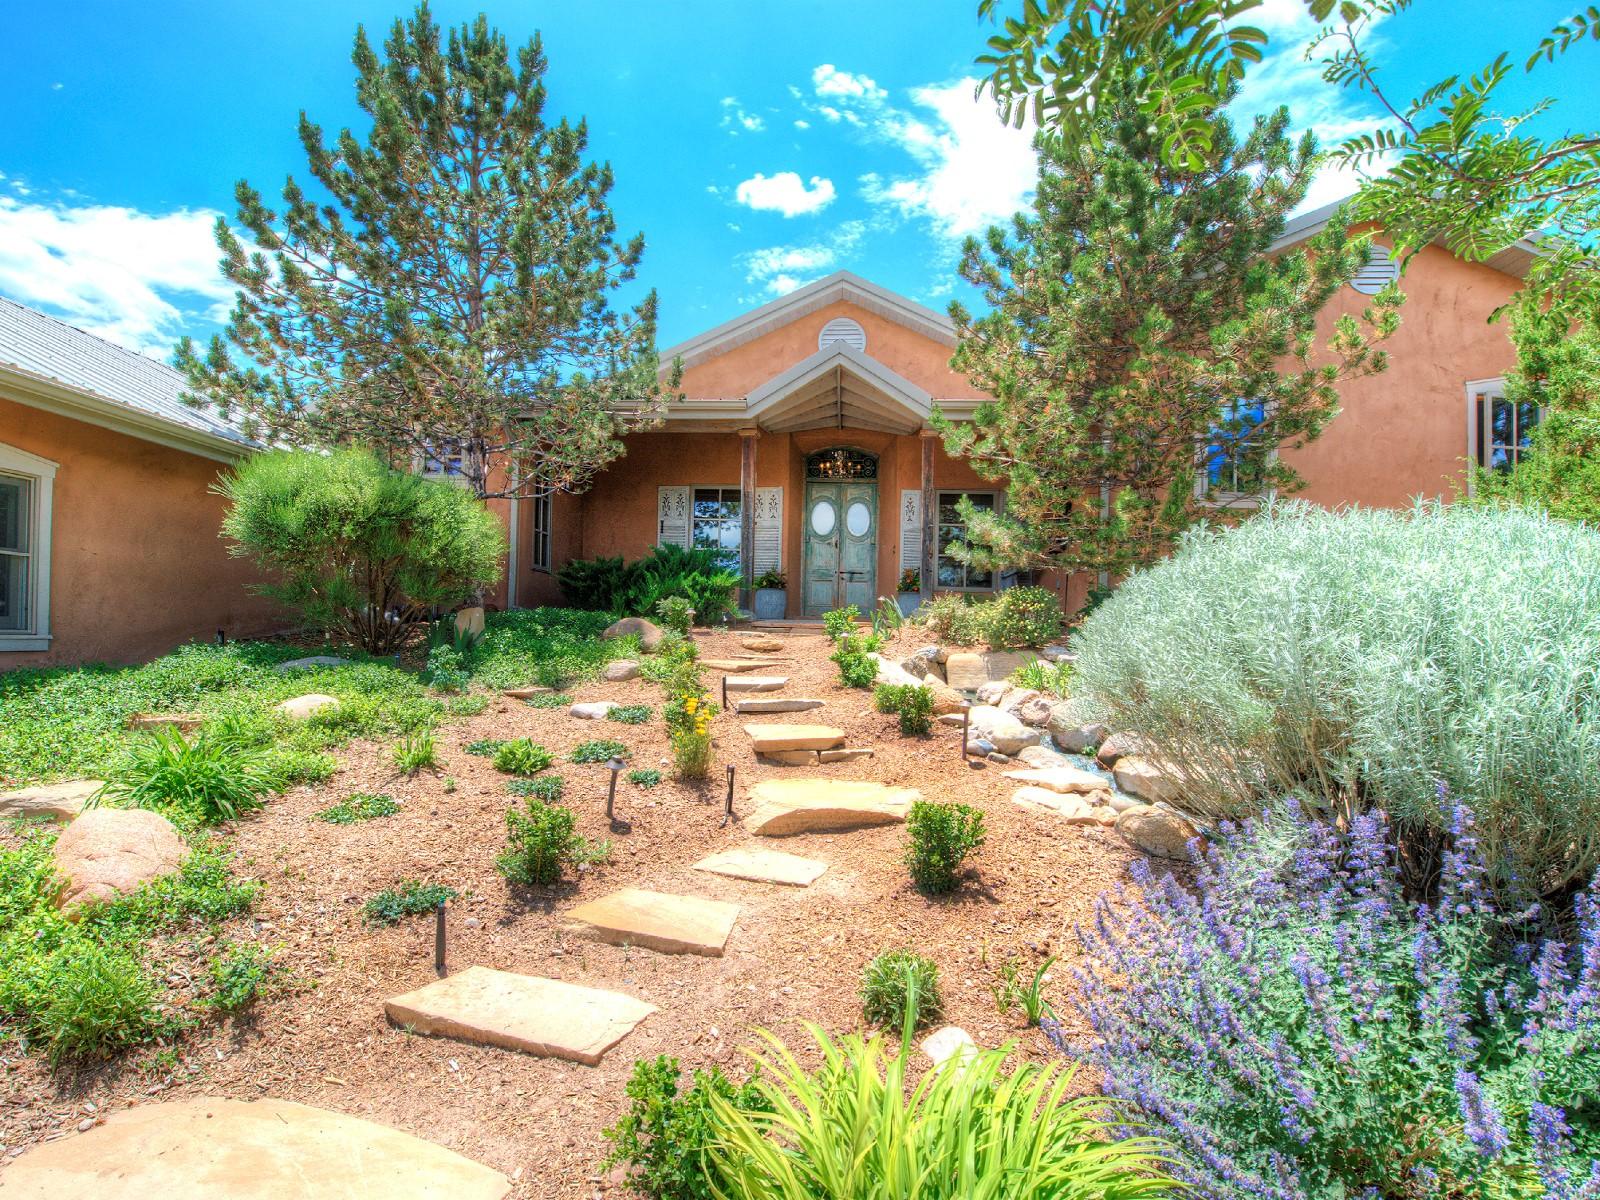 Single Family Home for Sale at 39 Yana Drive Santa Fe, New Mexico 87506 United States